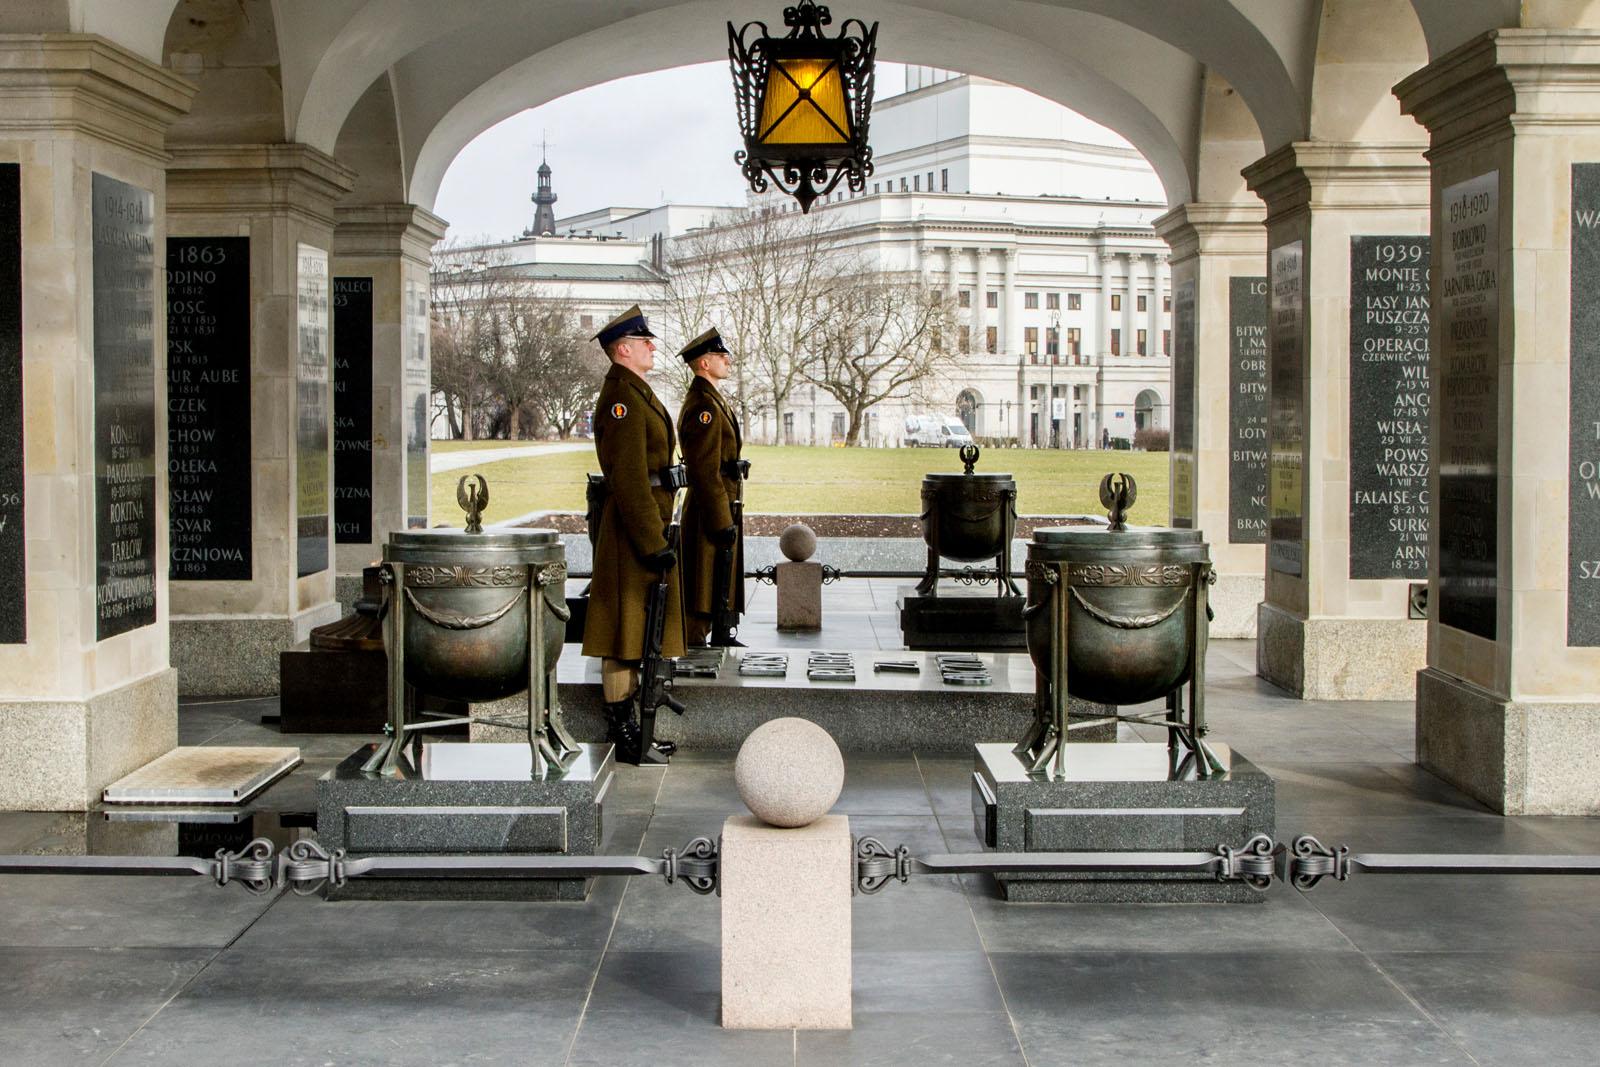 Men on guard: Park Ujazdowski